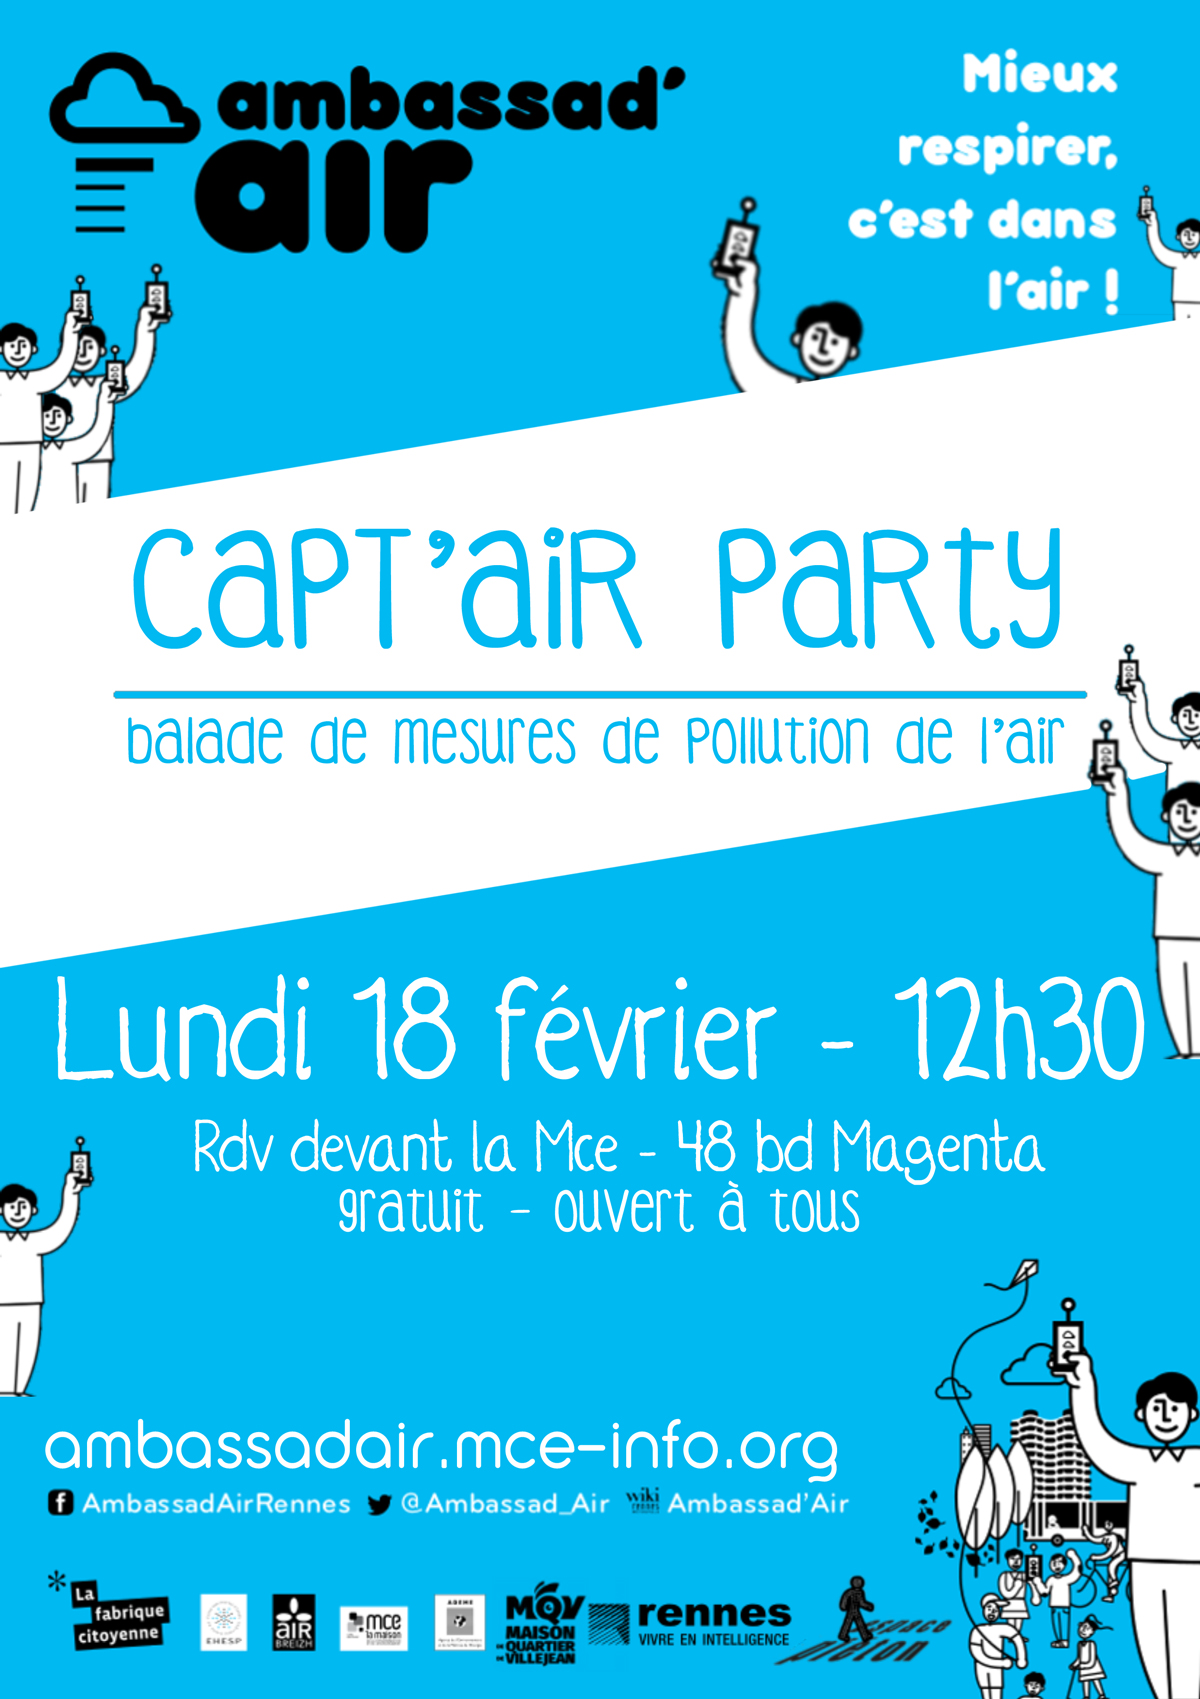 Captair-party-fev2019